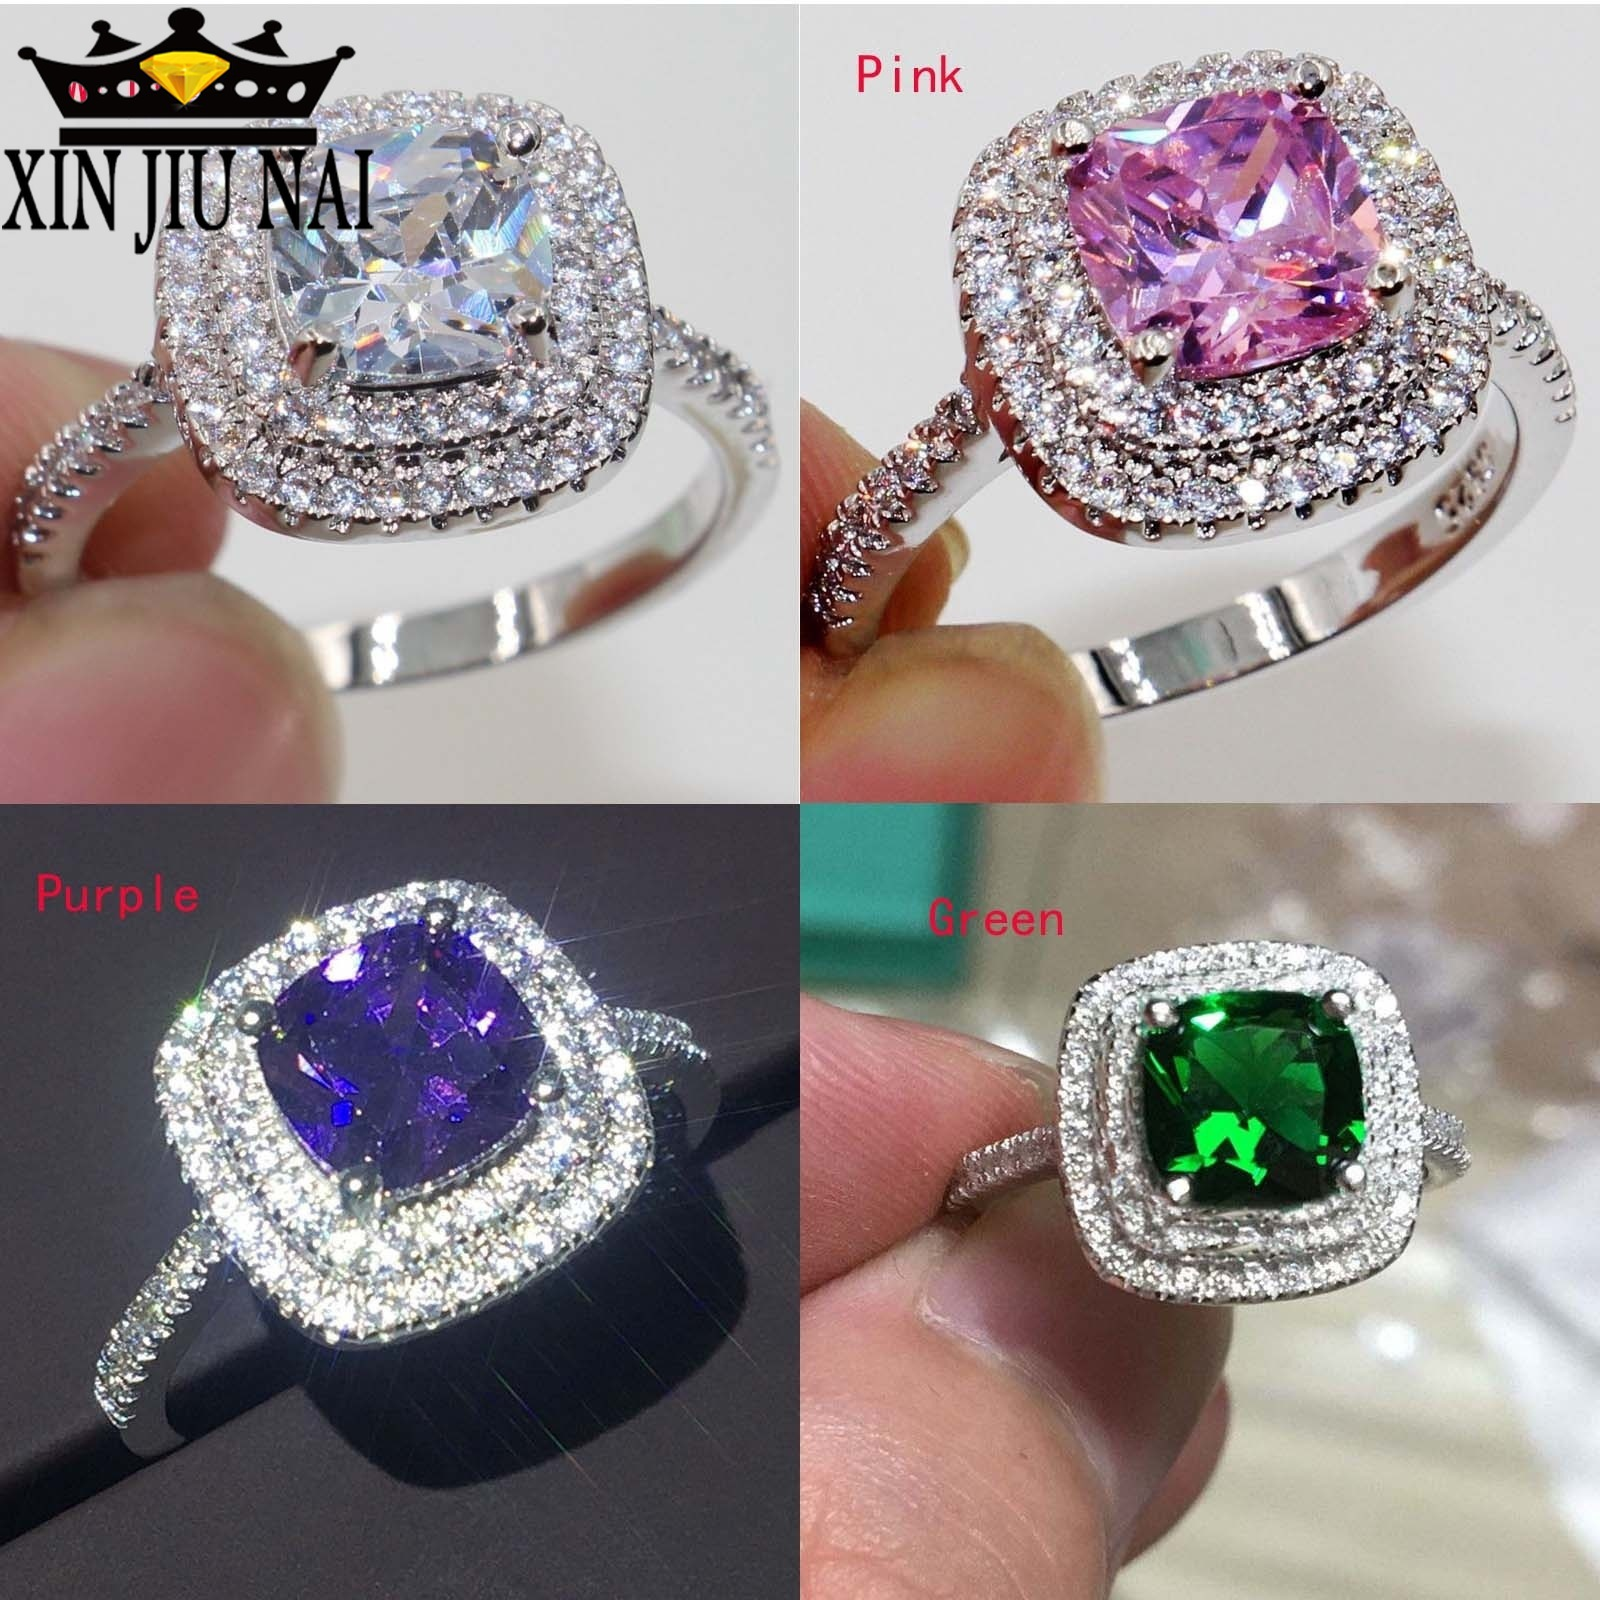 4 Colors Cut 8mm AAAAA Zircon Cz 925 Anillos Silver Women Wedding Ring Engagement Band /Pink/Purple Color Exquisite Bijoux 6-10